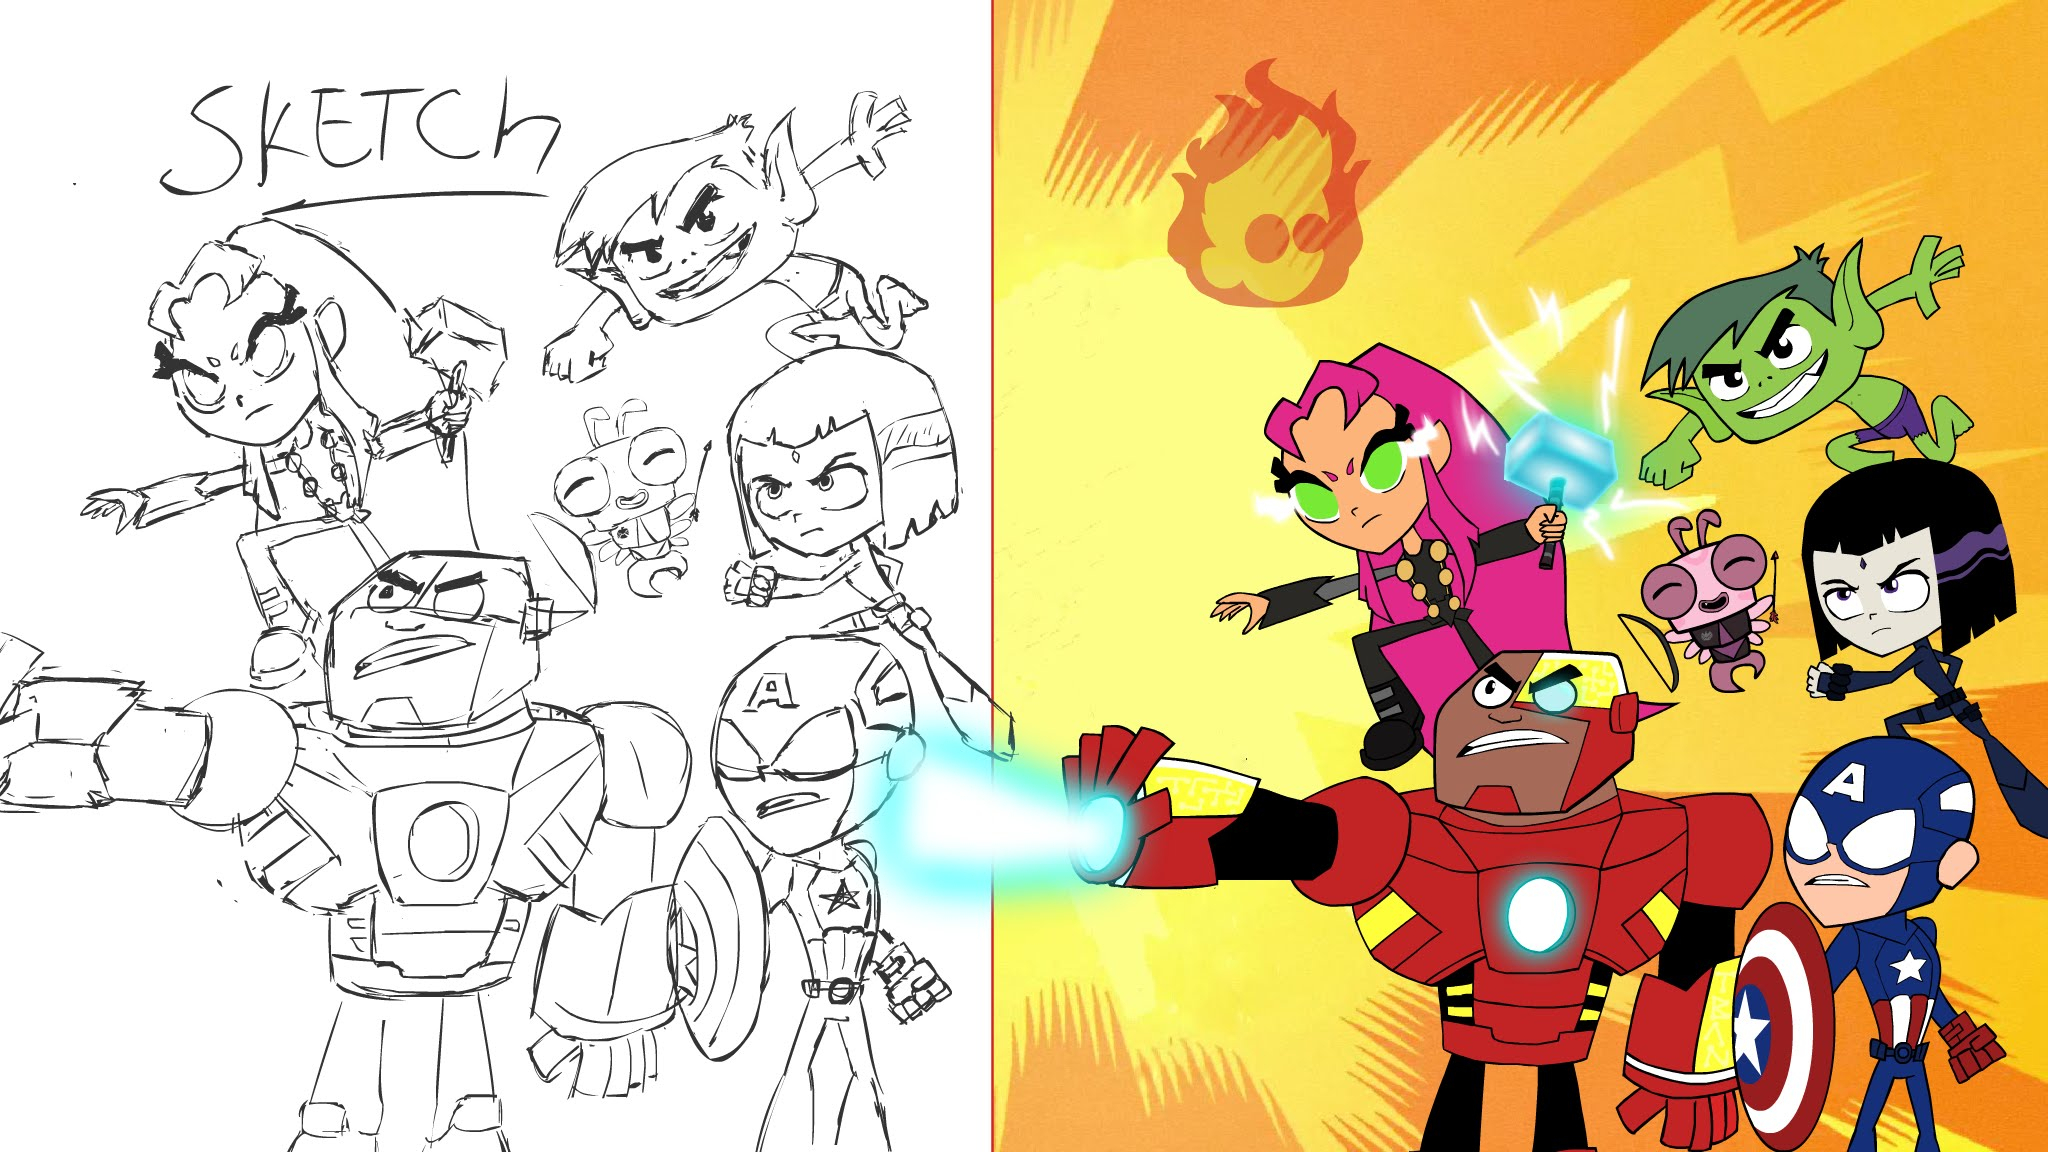 2048x1152 Teen Titans Go Drawing Teen Titans Go As The Avengers (Speed